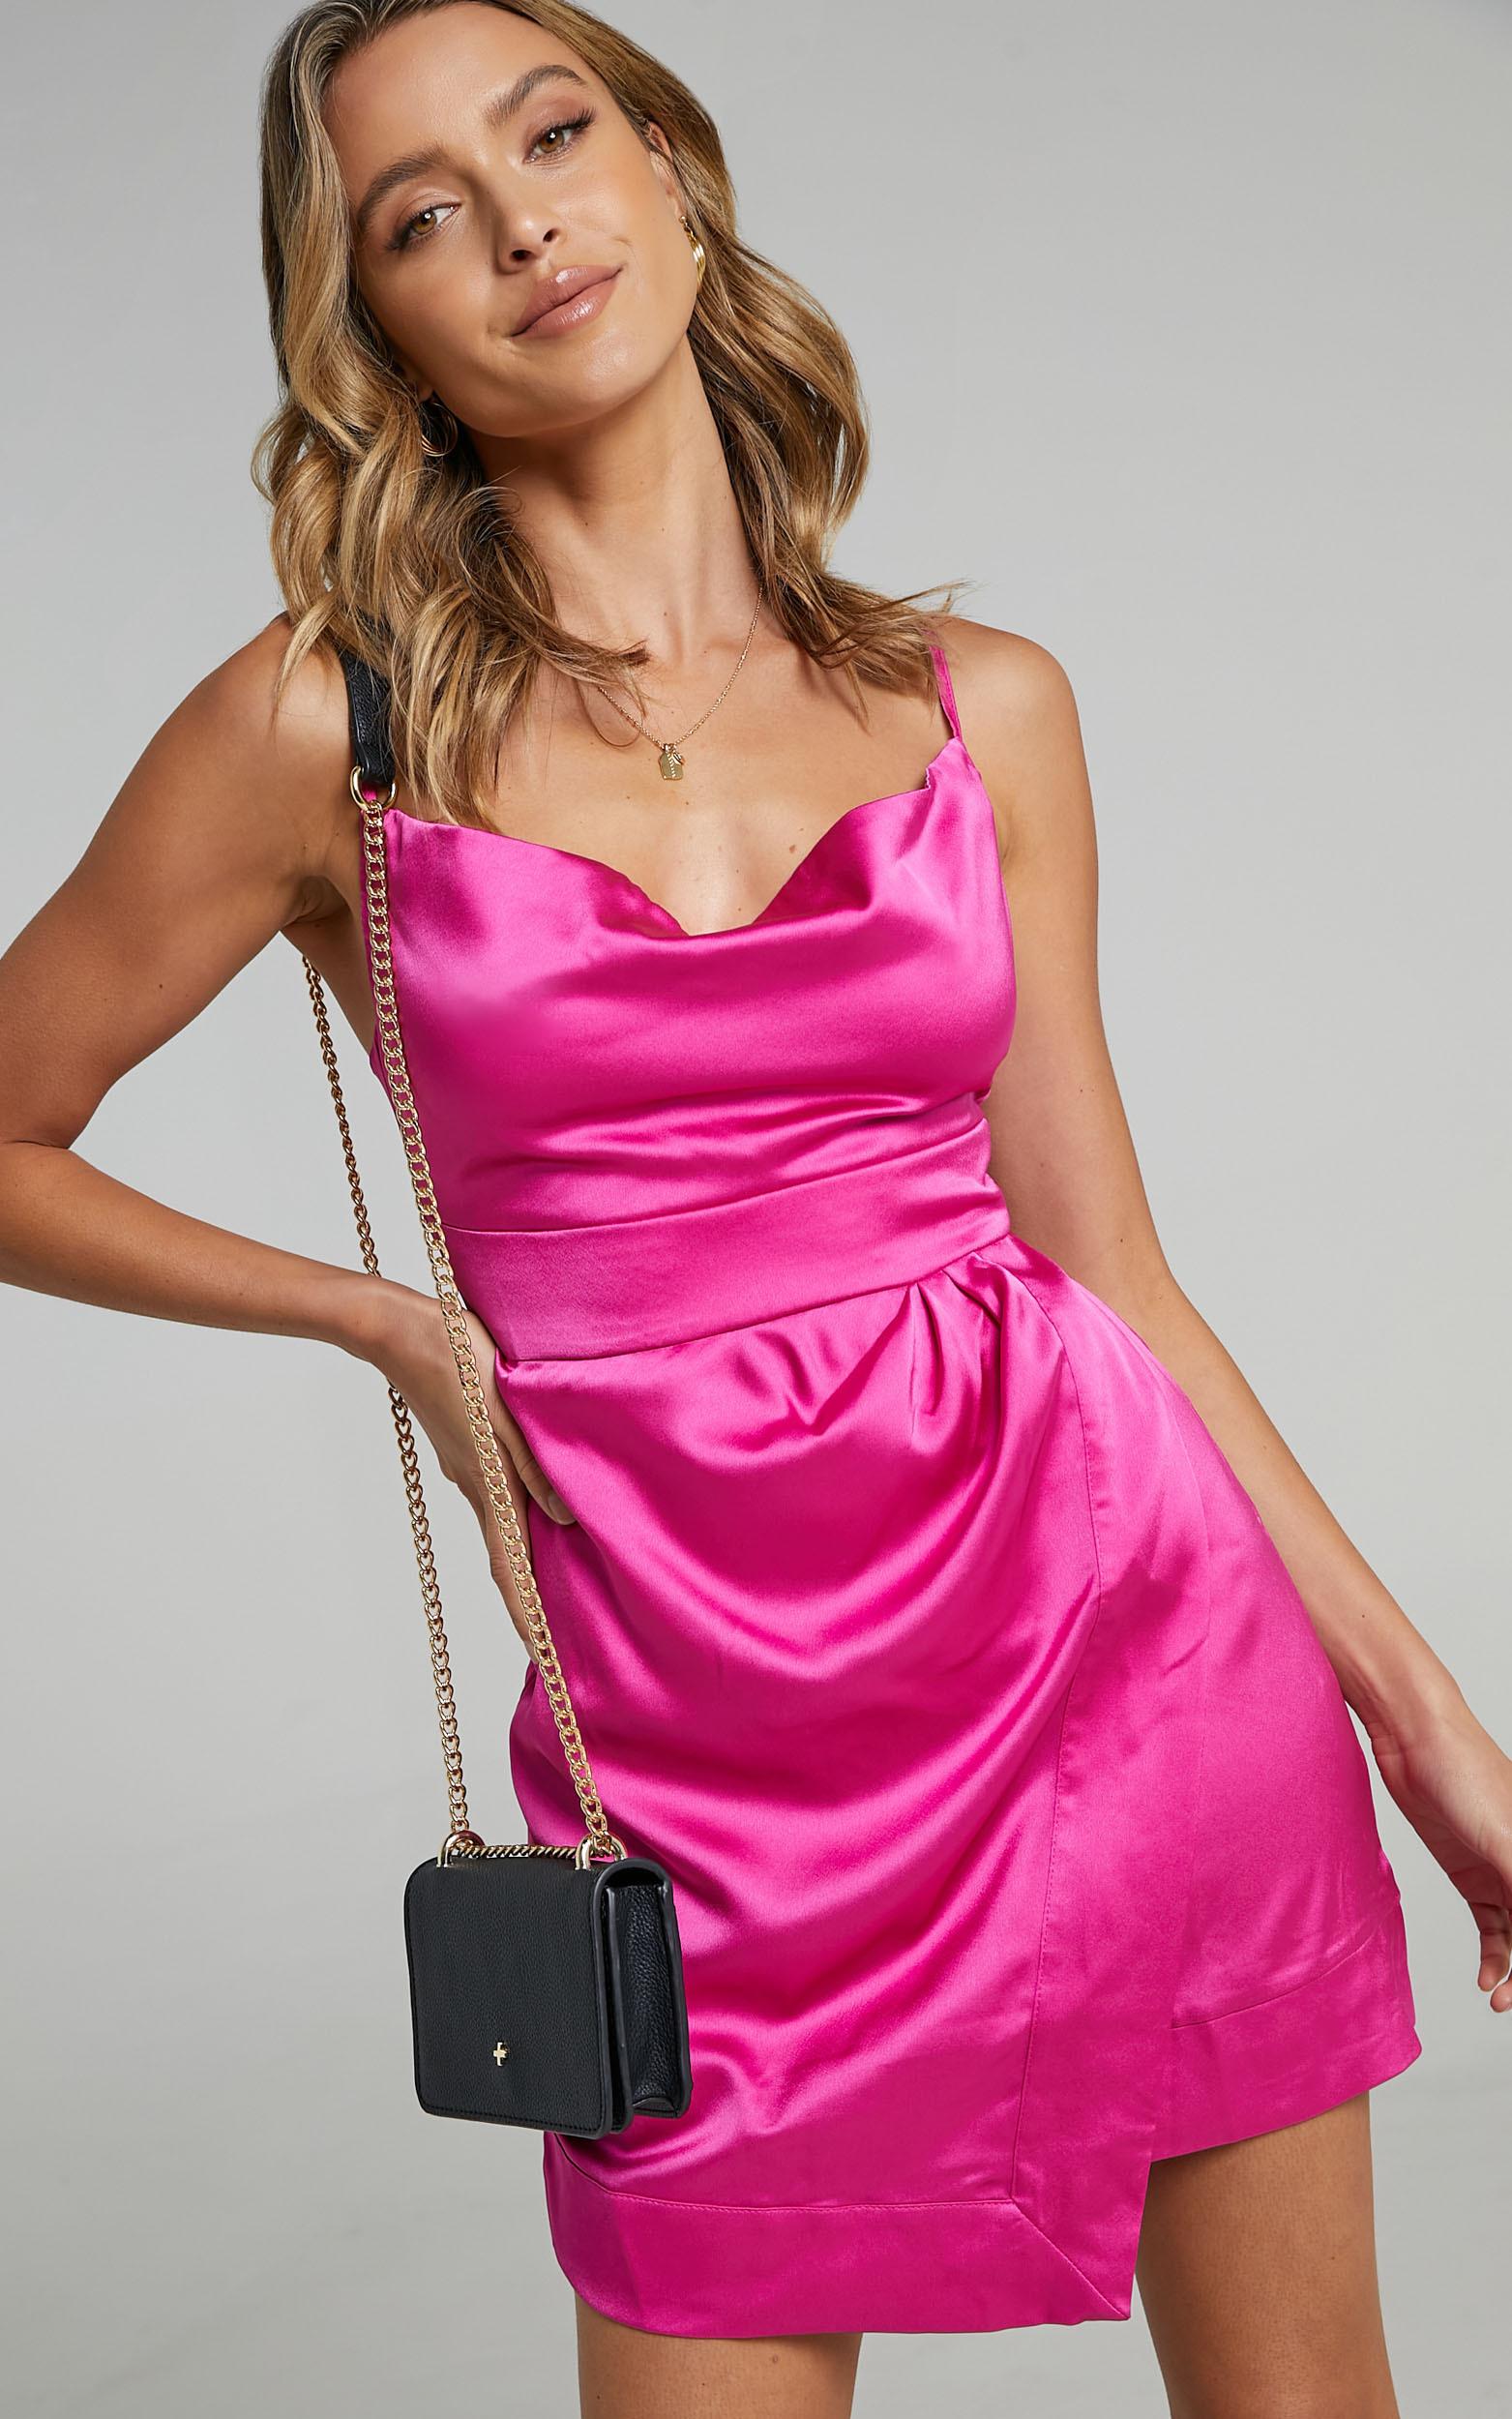 Naesa Dress in Pink Satin - 06, PNK1, hi-res image number null